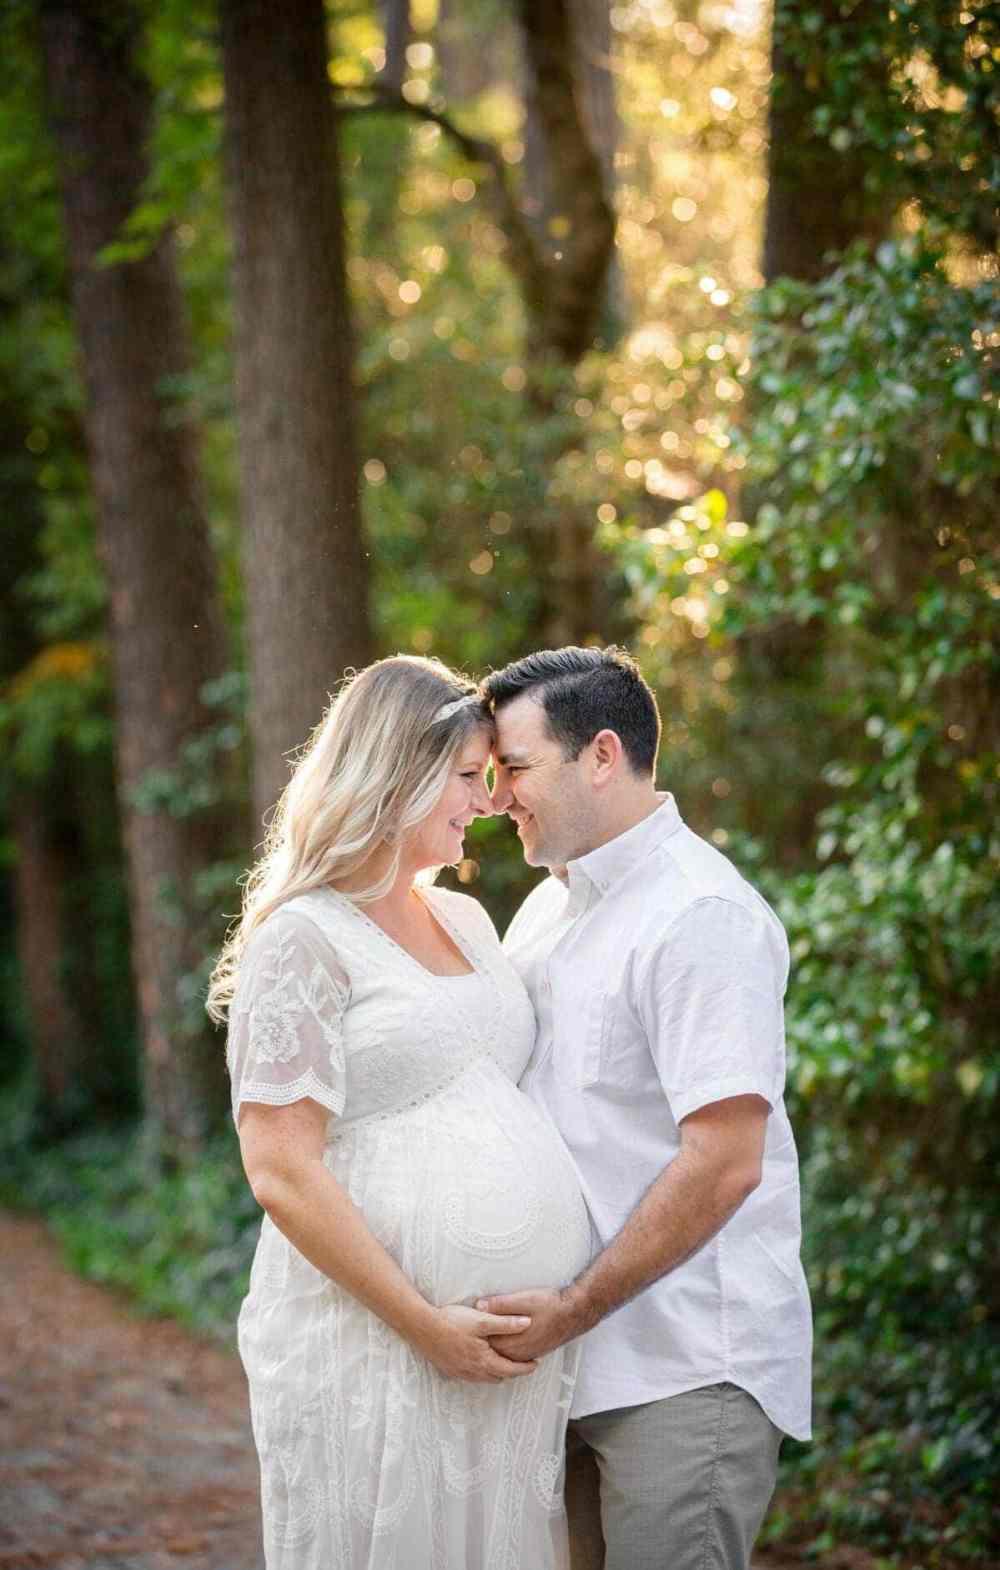 Family maternity photo session - Alisha Rudd Photography - bumpdate 34 weeks